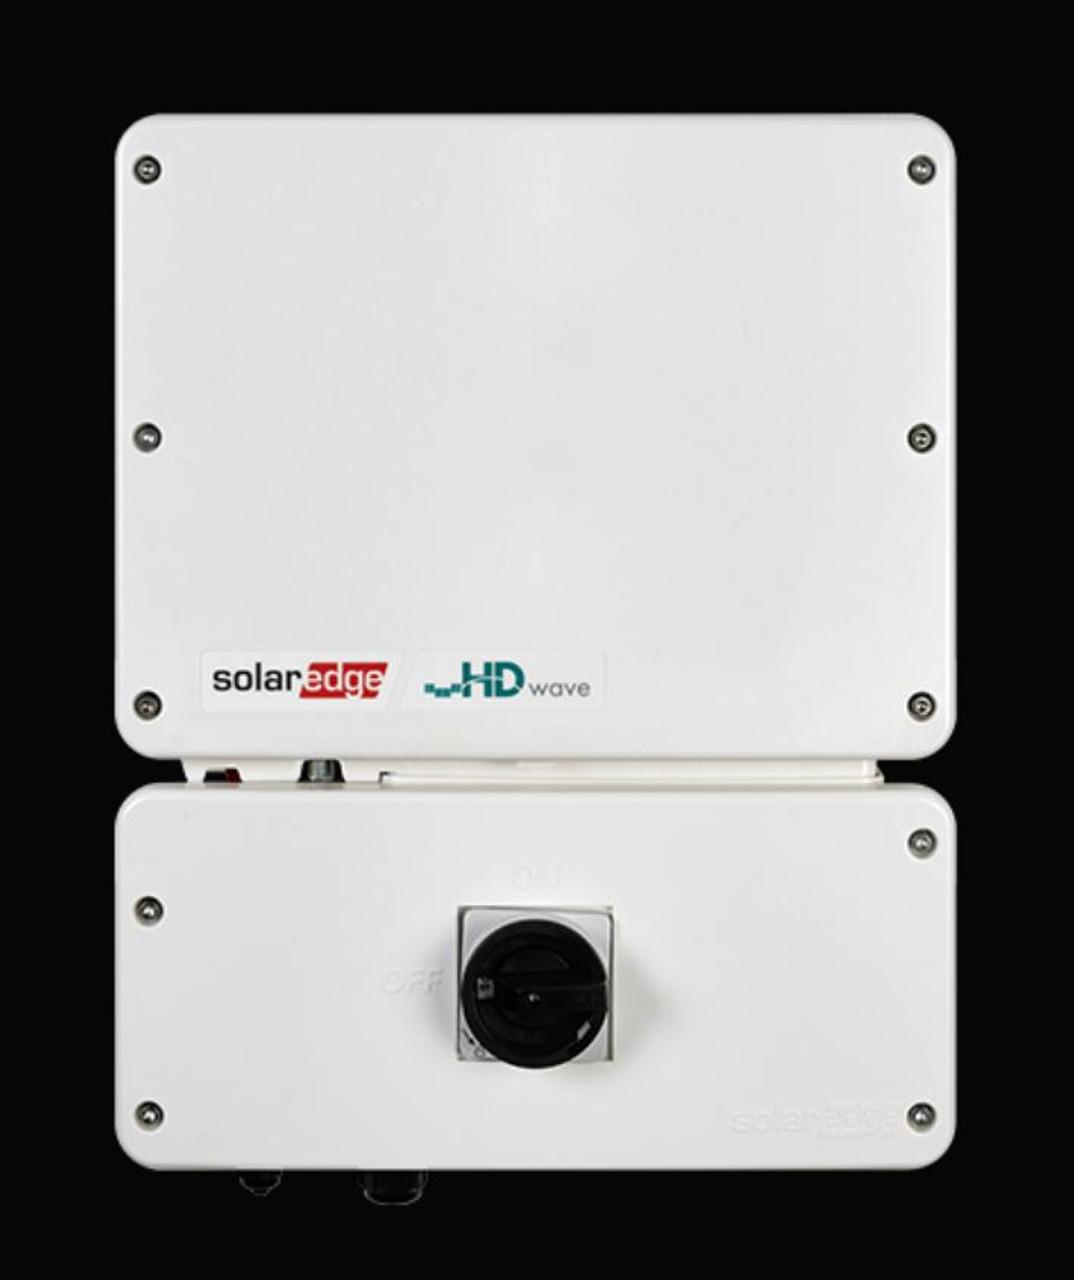 SolarEdge SE3800H-US HD Wave Grid Tie Inverter 3800W 240 VAC, String Inverter